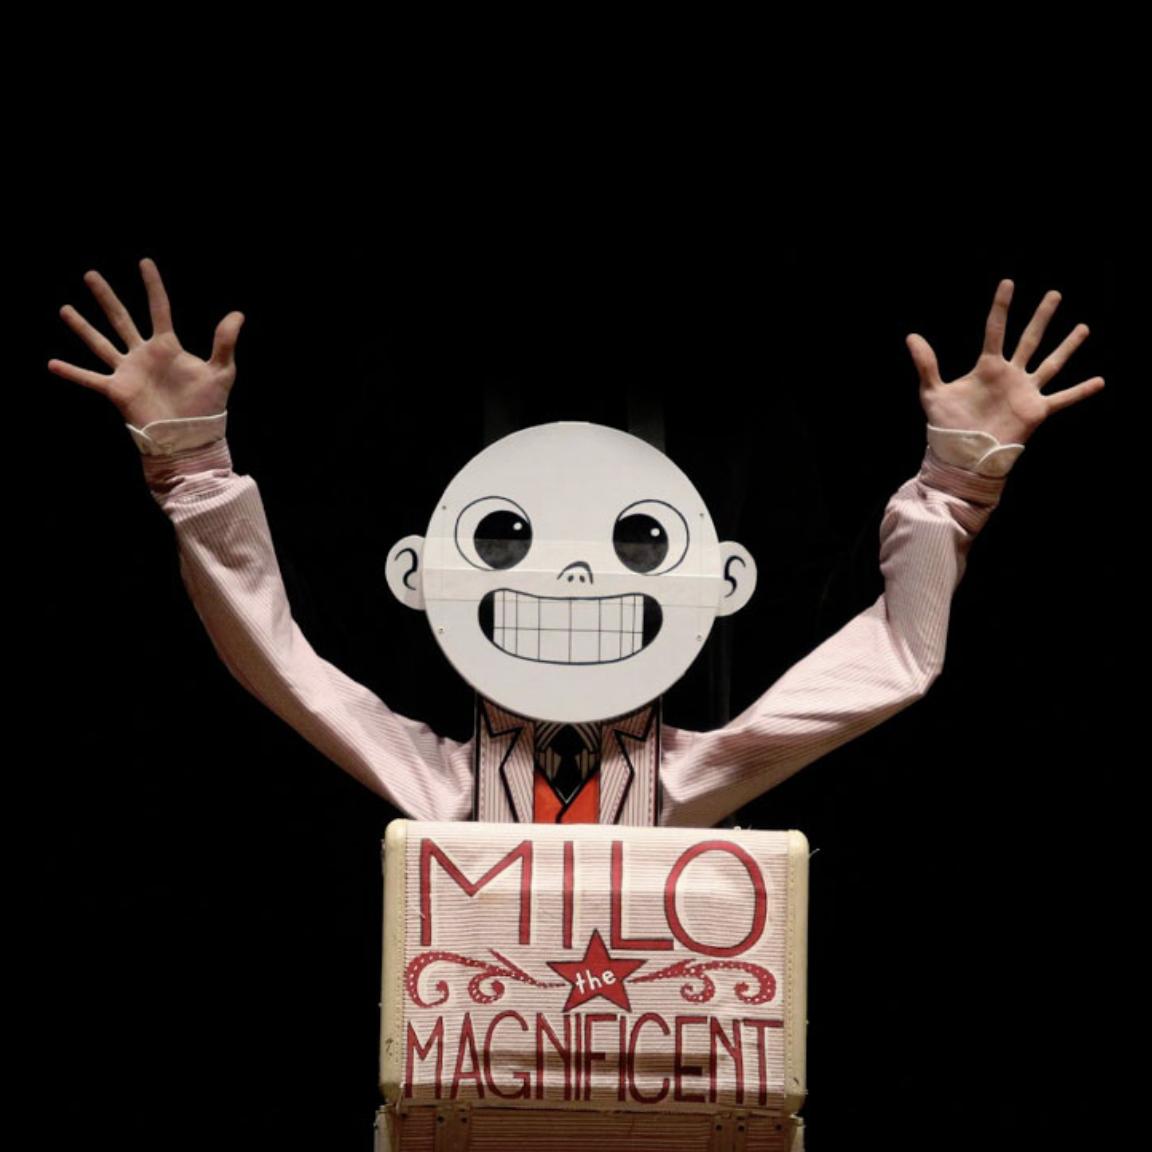 Milo the Magnificent